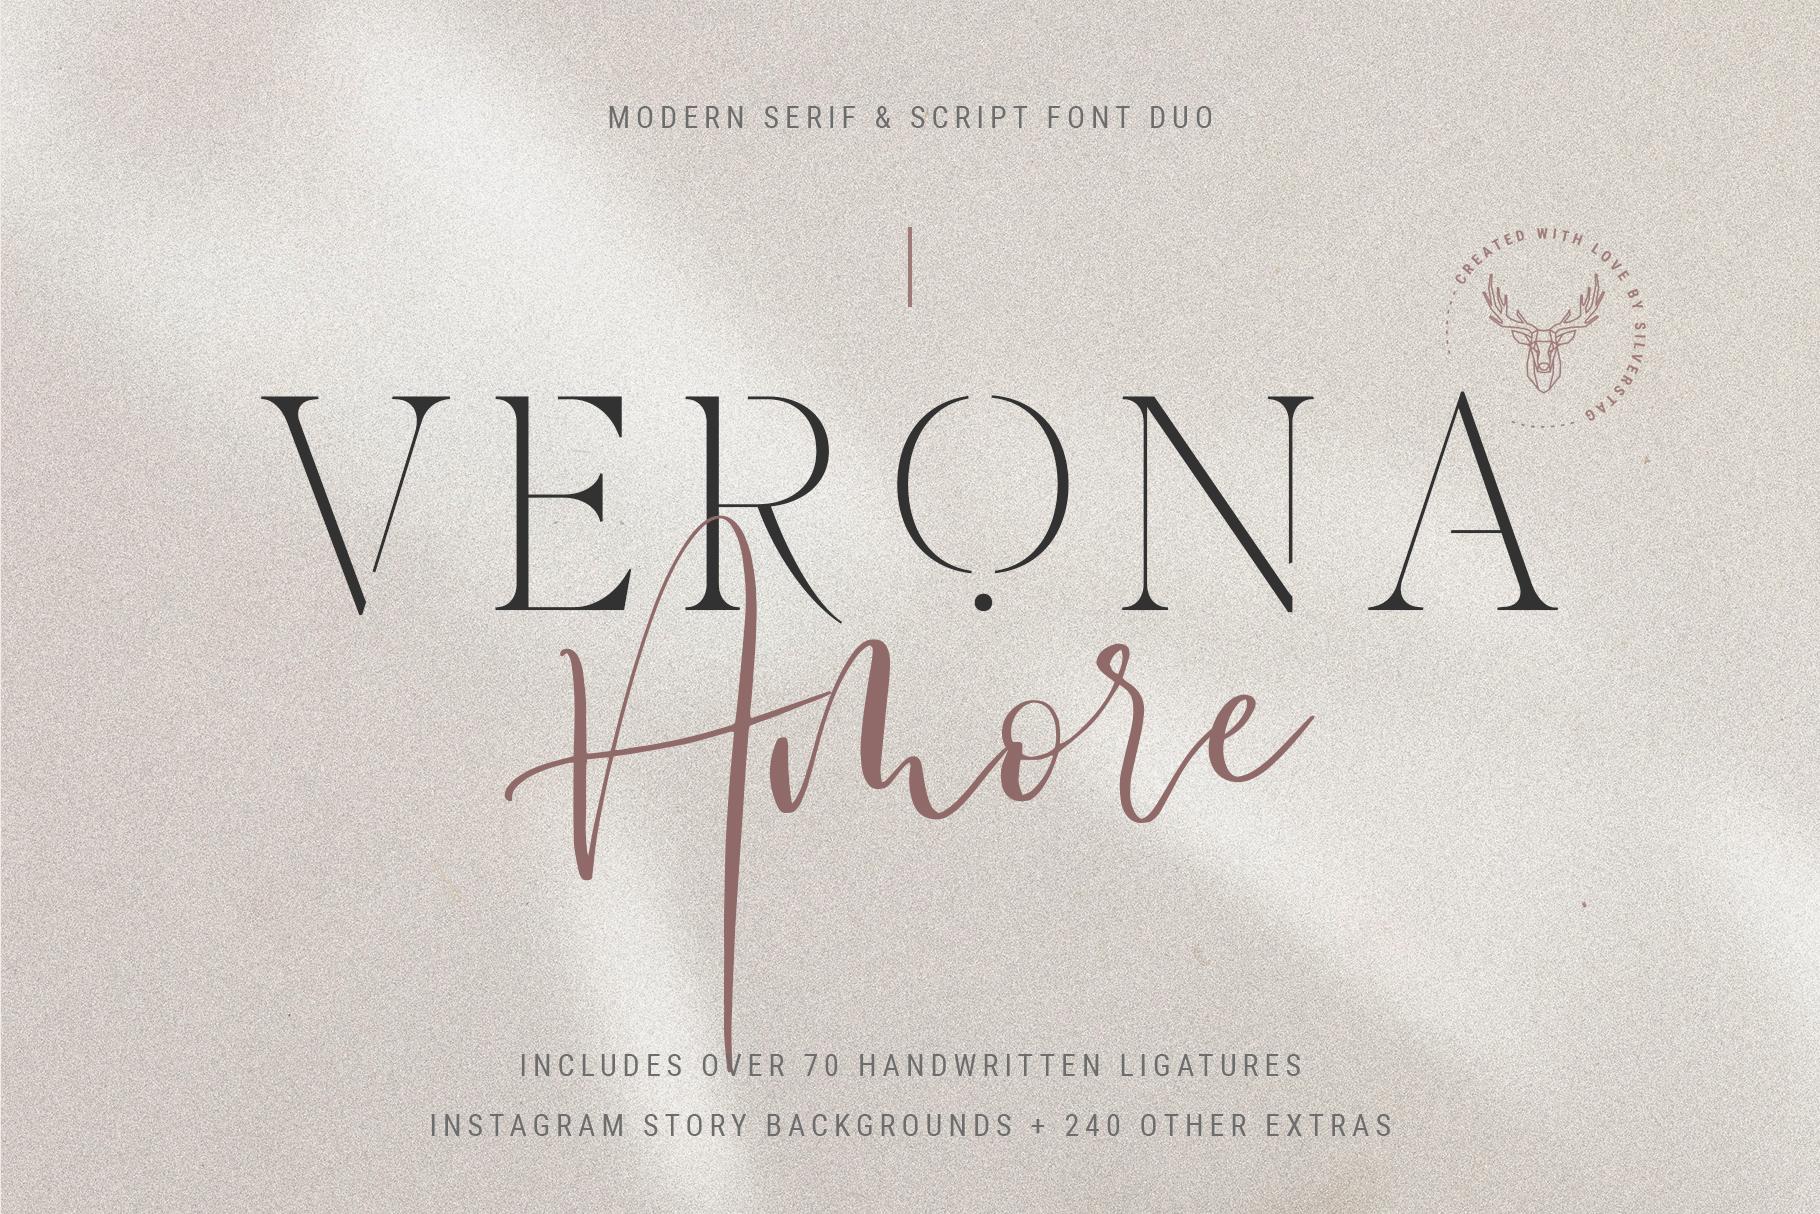 Verona Amore - Modern Serif & Script Font Duo & Extras example image 1